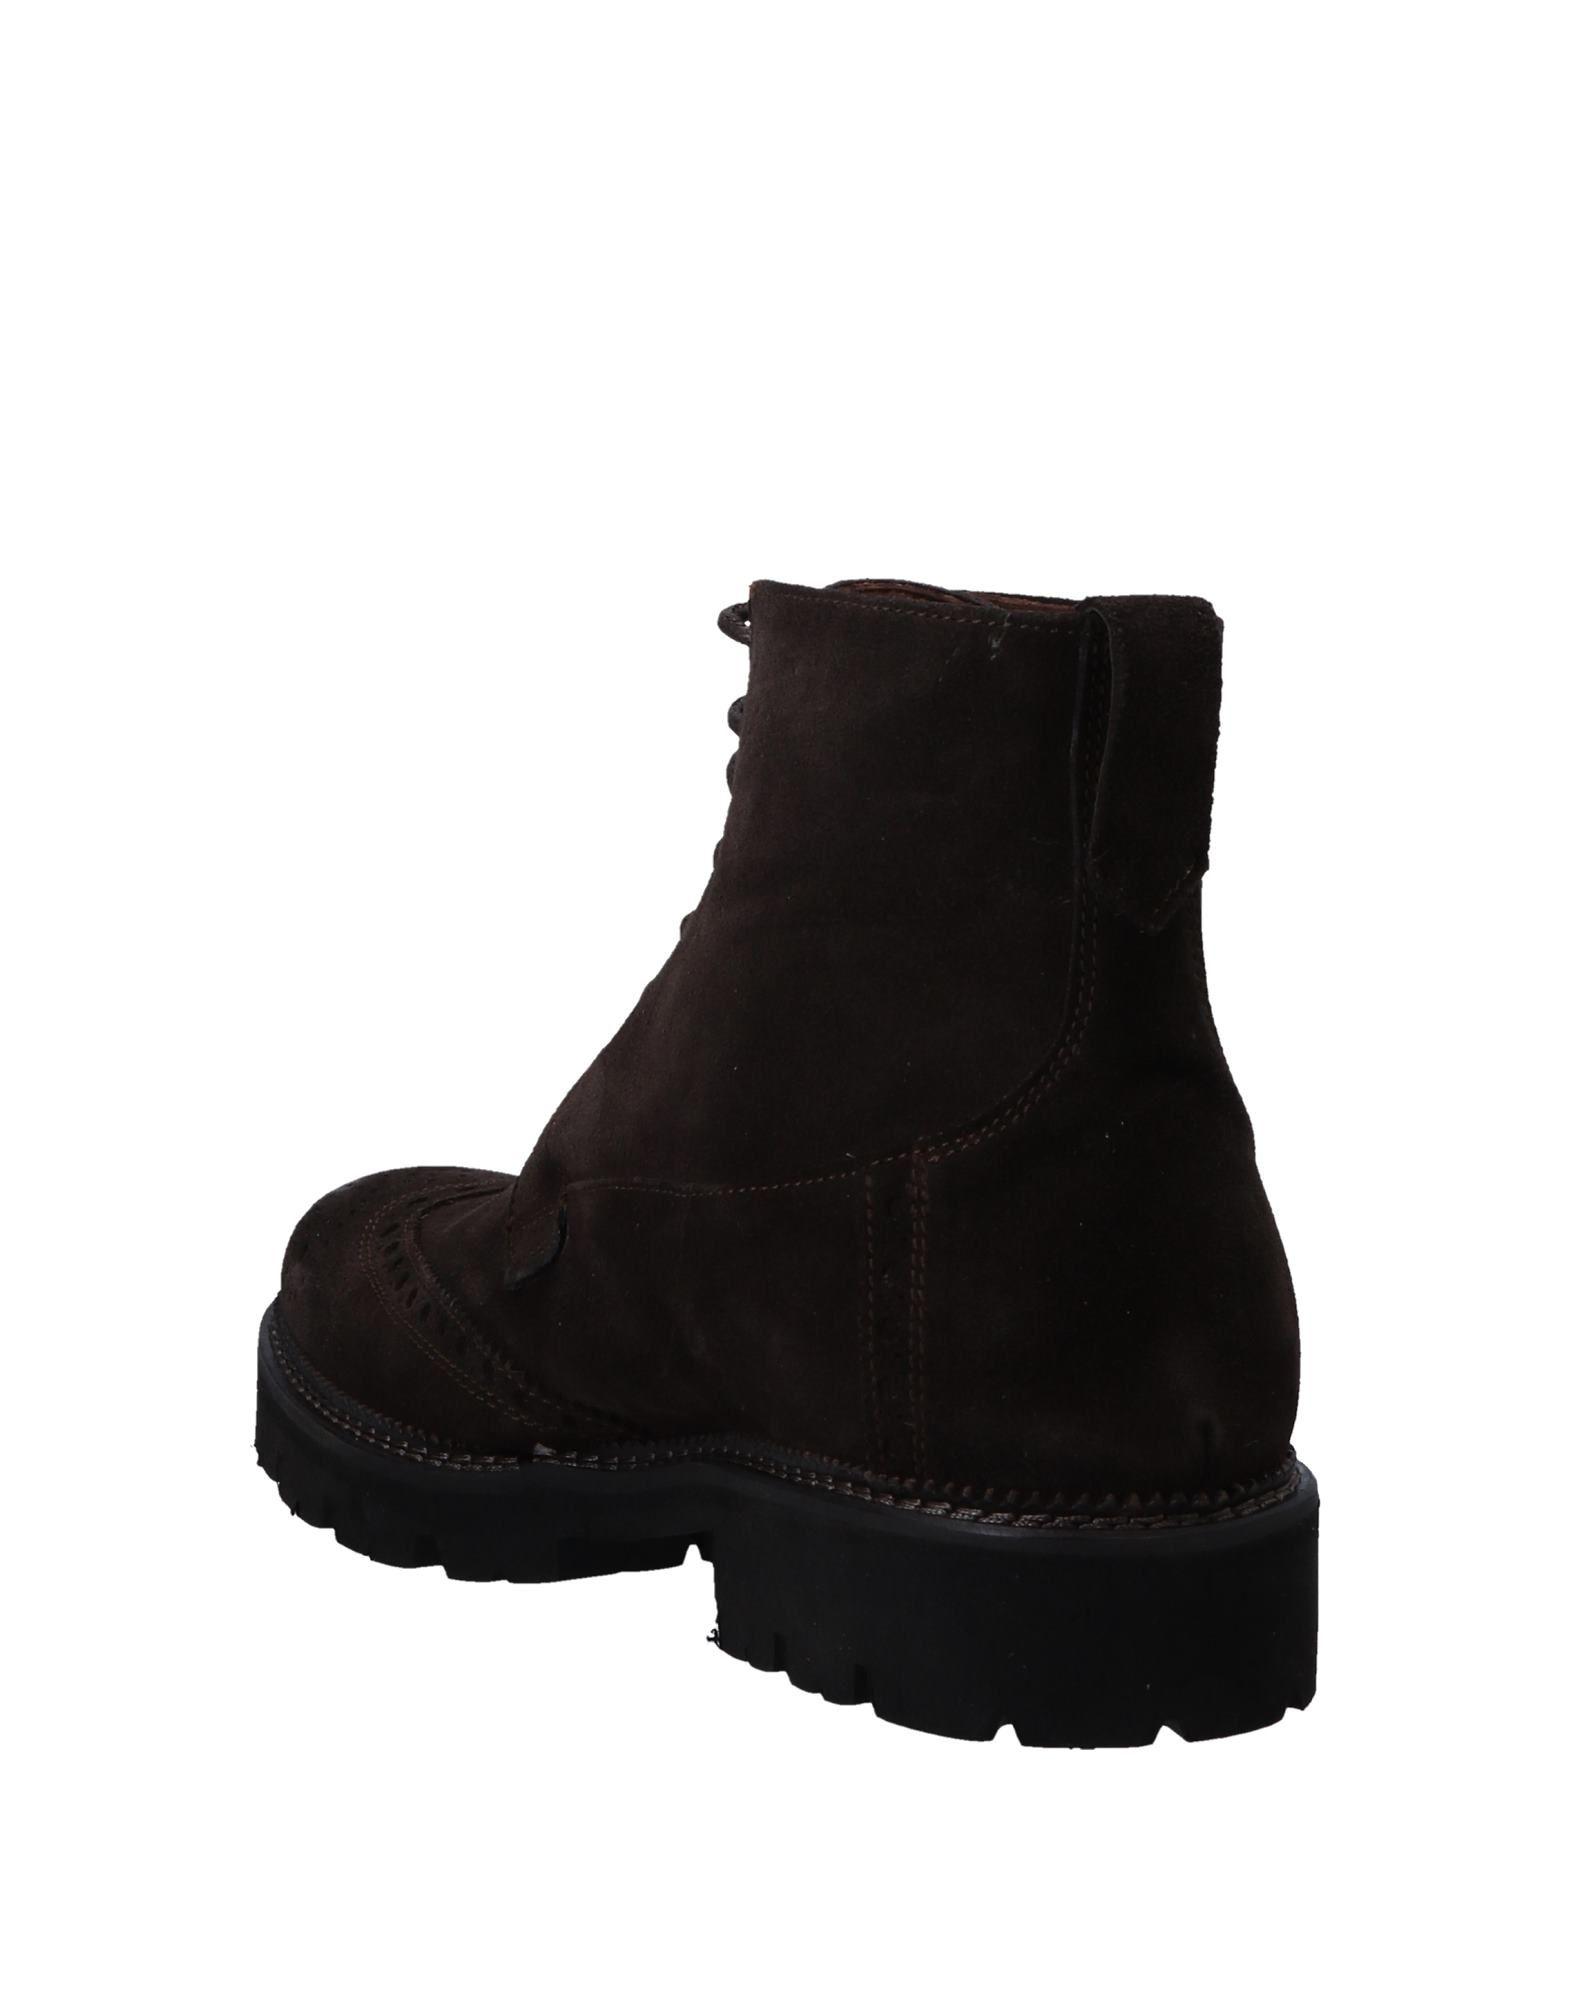 Baldinini Stiefelette Qualität Herren  11554802TC Gute Qualität Stiefelette beliebte Schuhe 543ba2